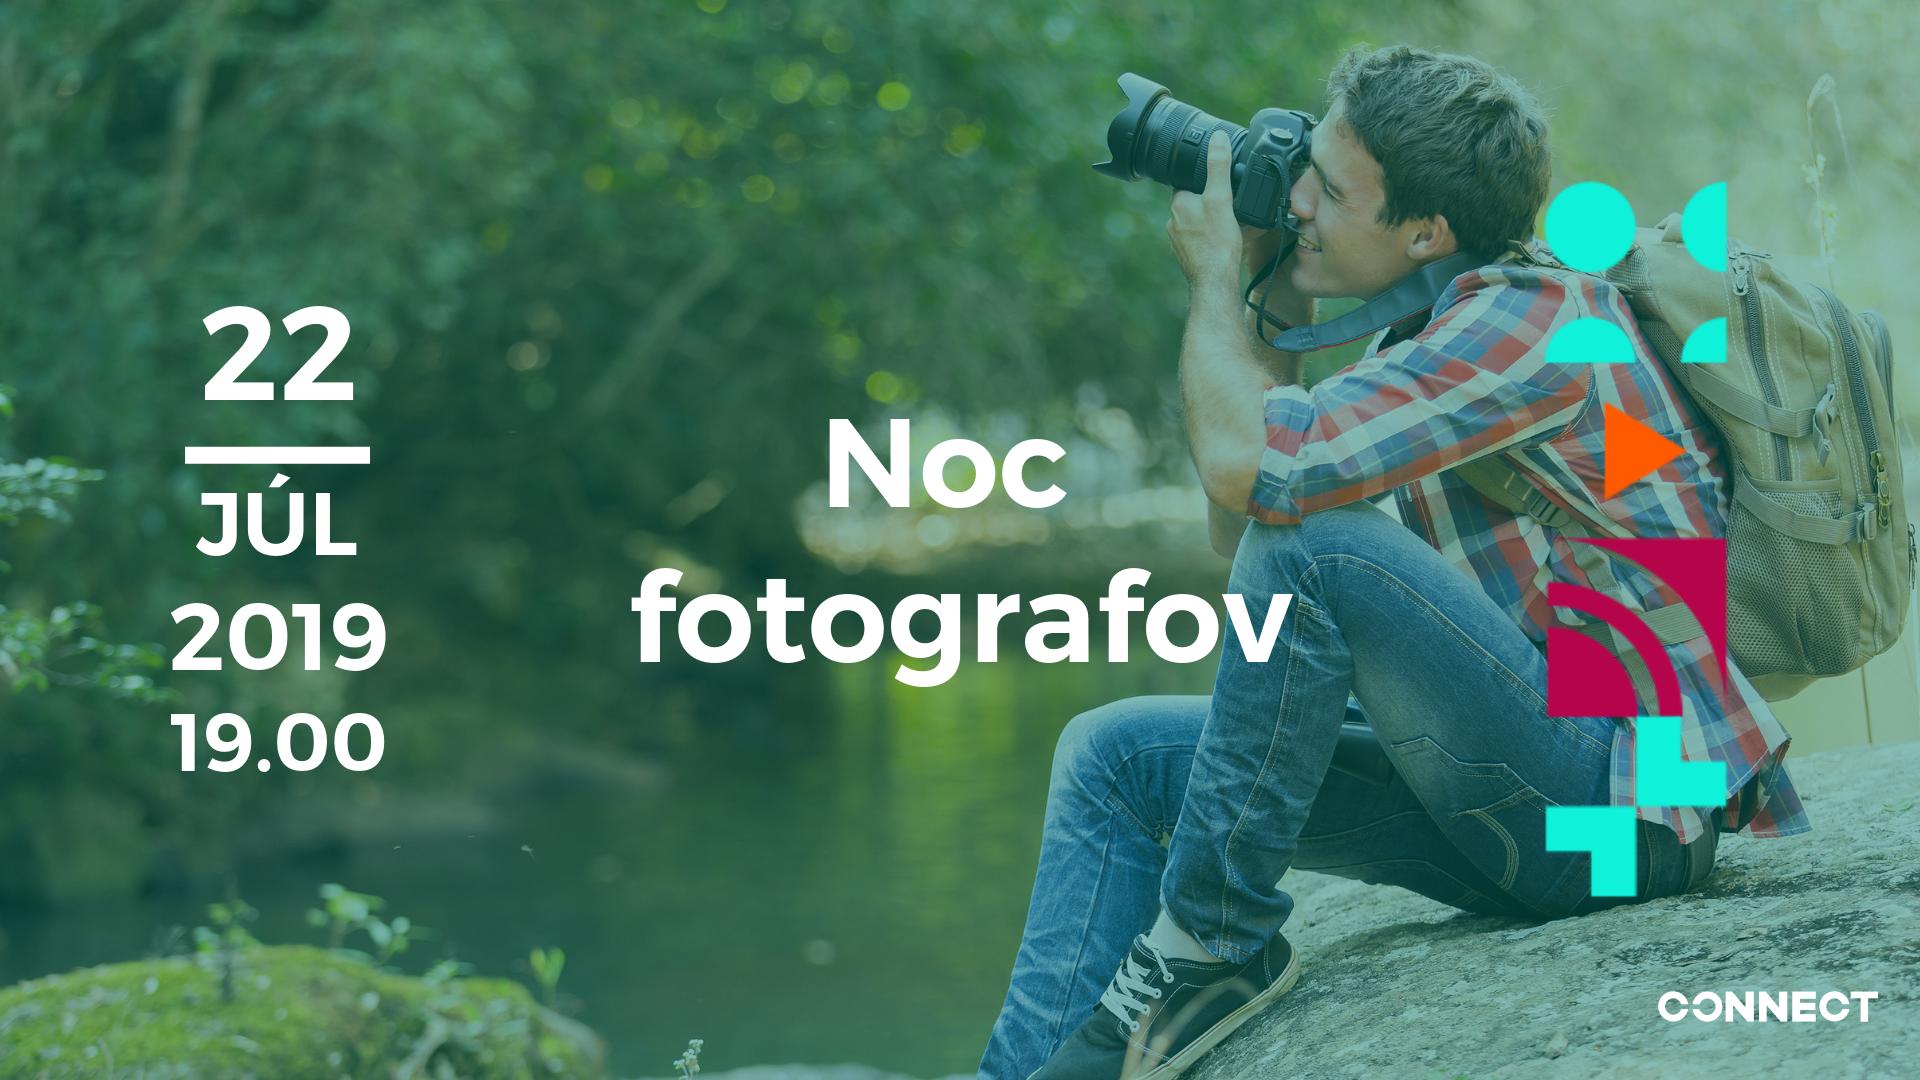 Noc fotografov – Júl 2019 – videozáznam